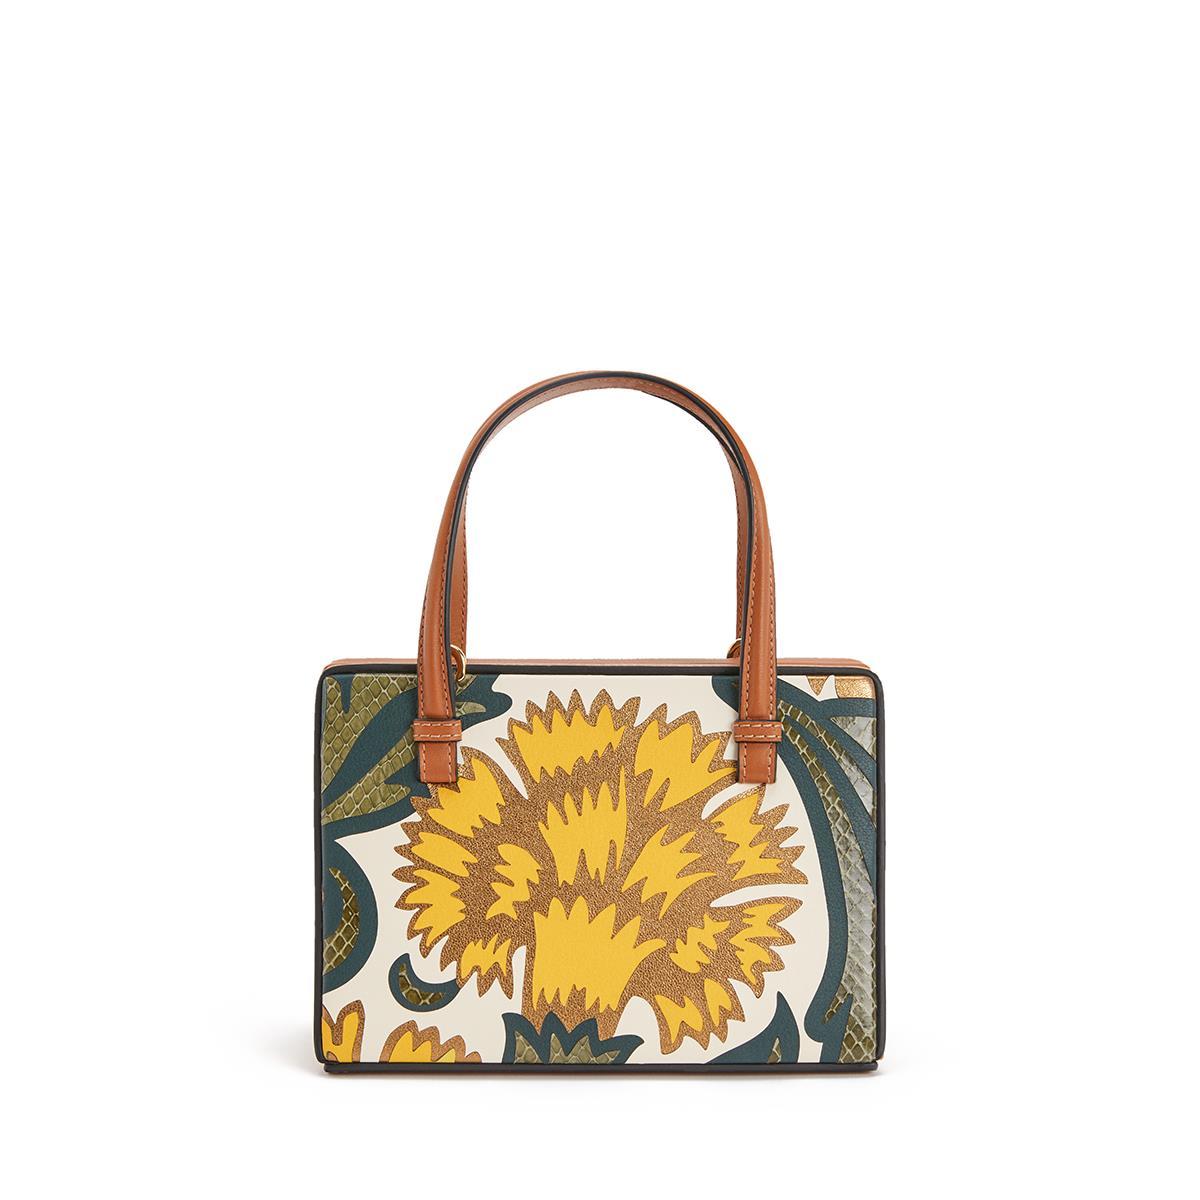 Postal Floral Small Bag